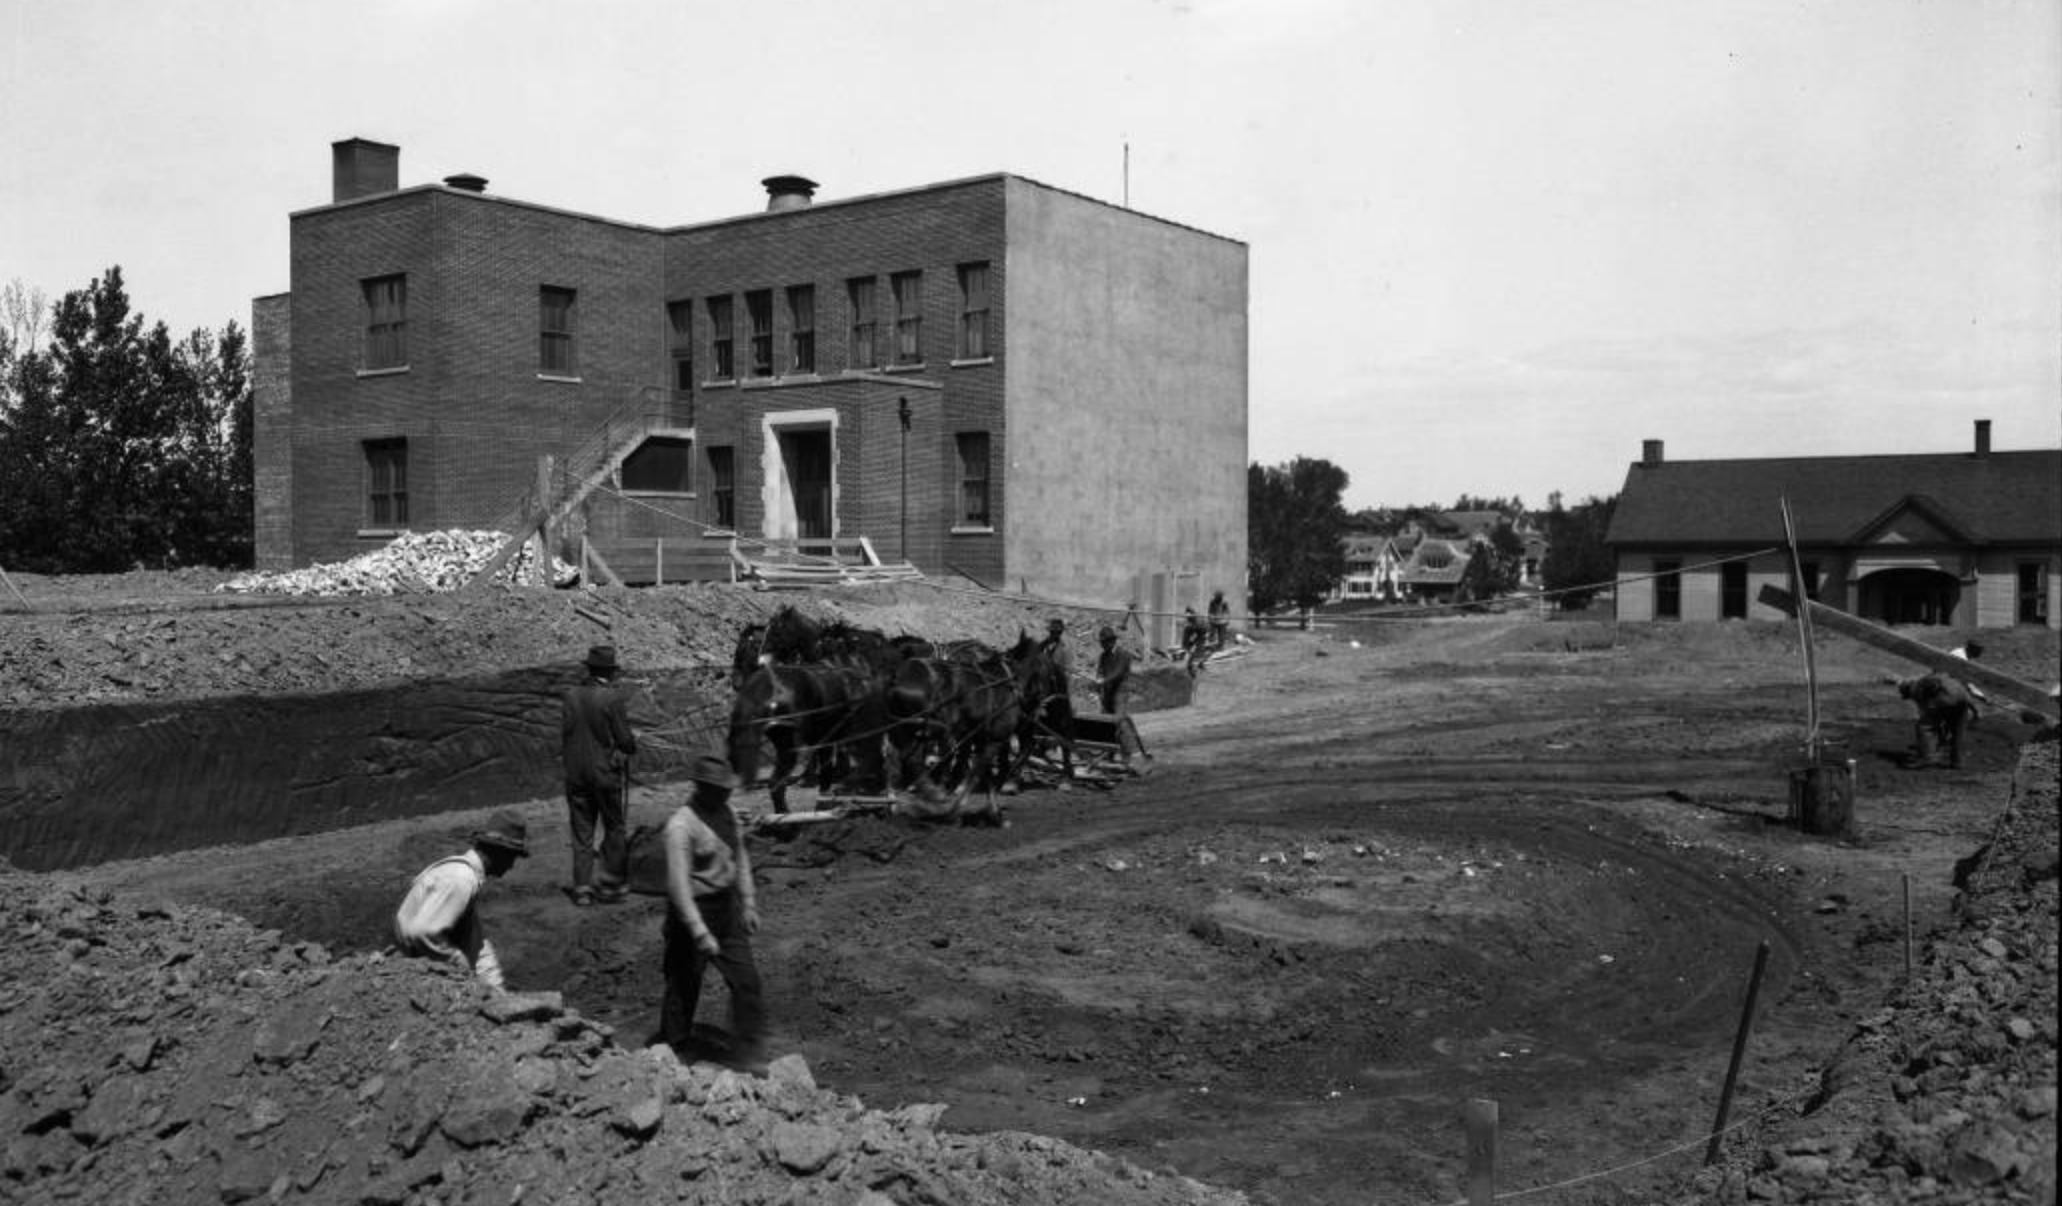 Minne Lusa School, North Omaha, Nebraska